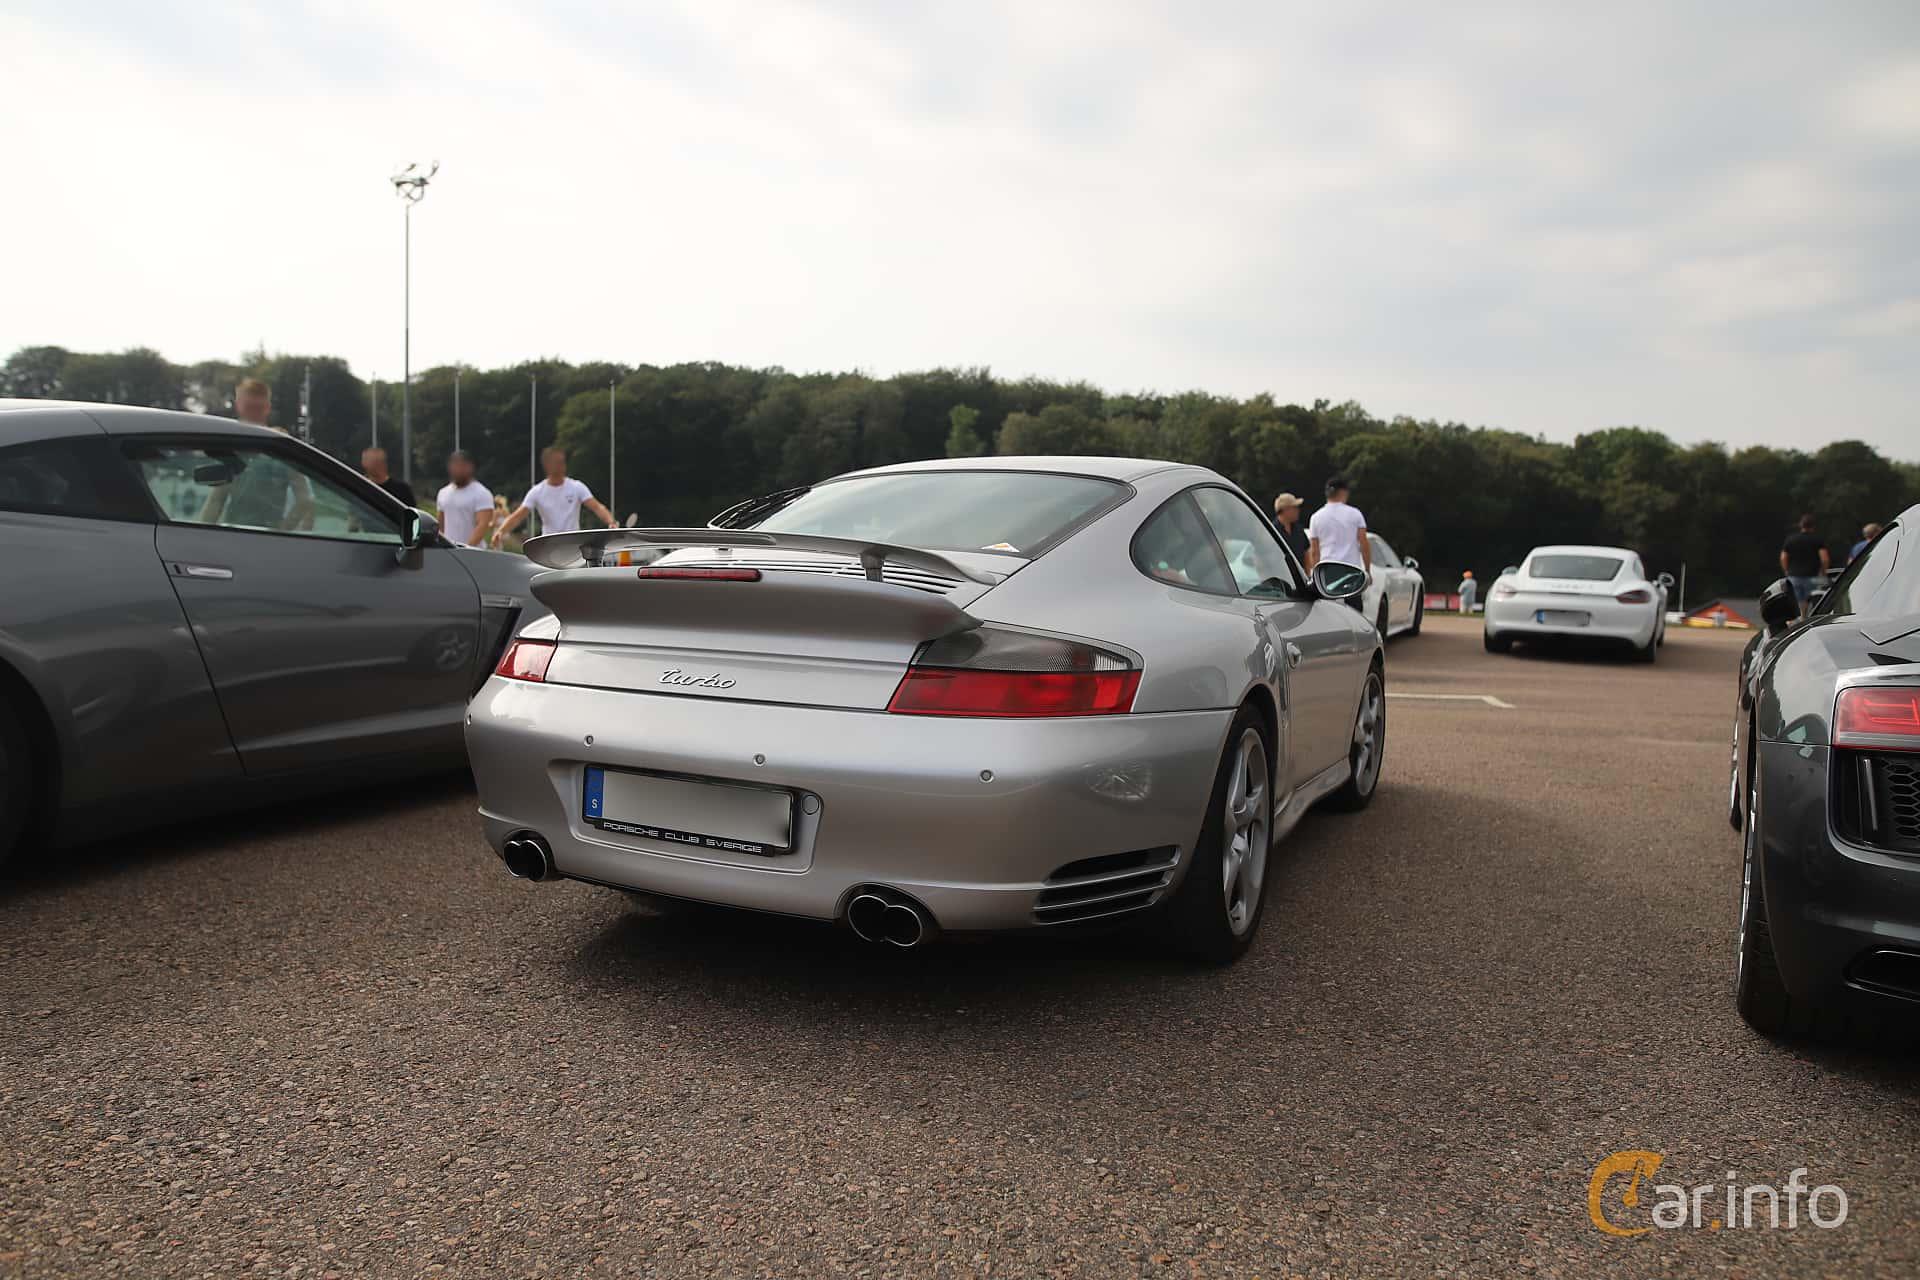 Porsche 911 Turbo  TipTronic, 420hp, 2004 at Autoropa Racing day Knutstorp 2019